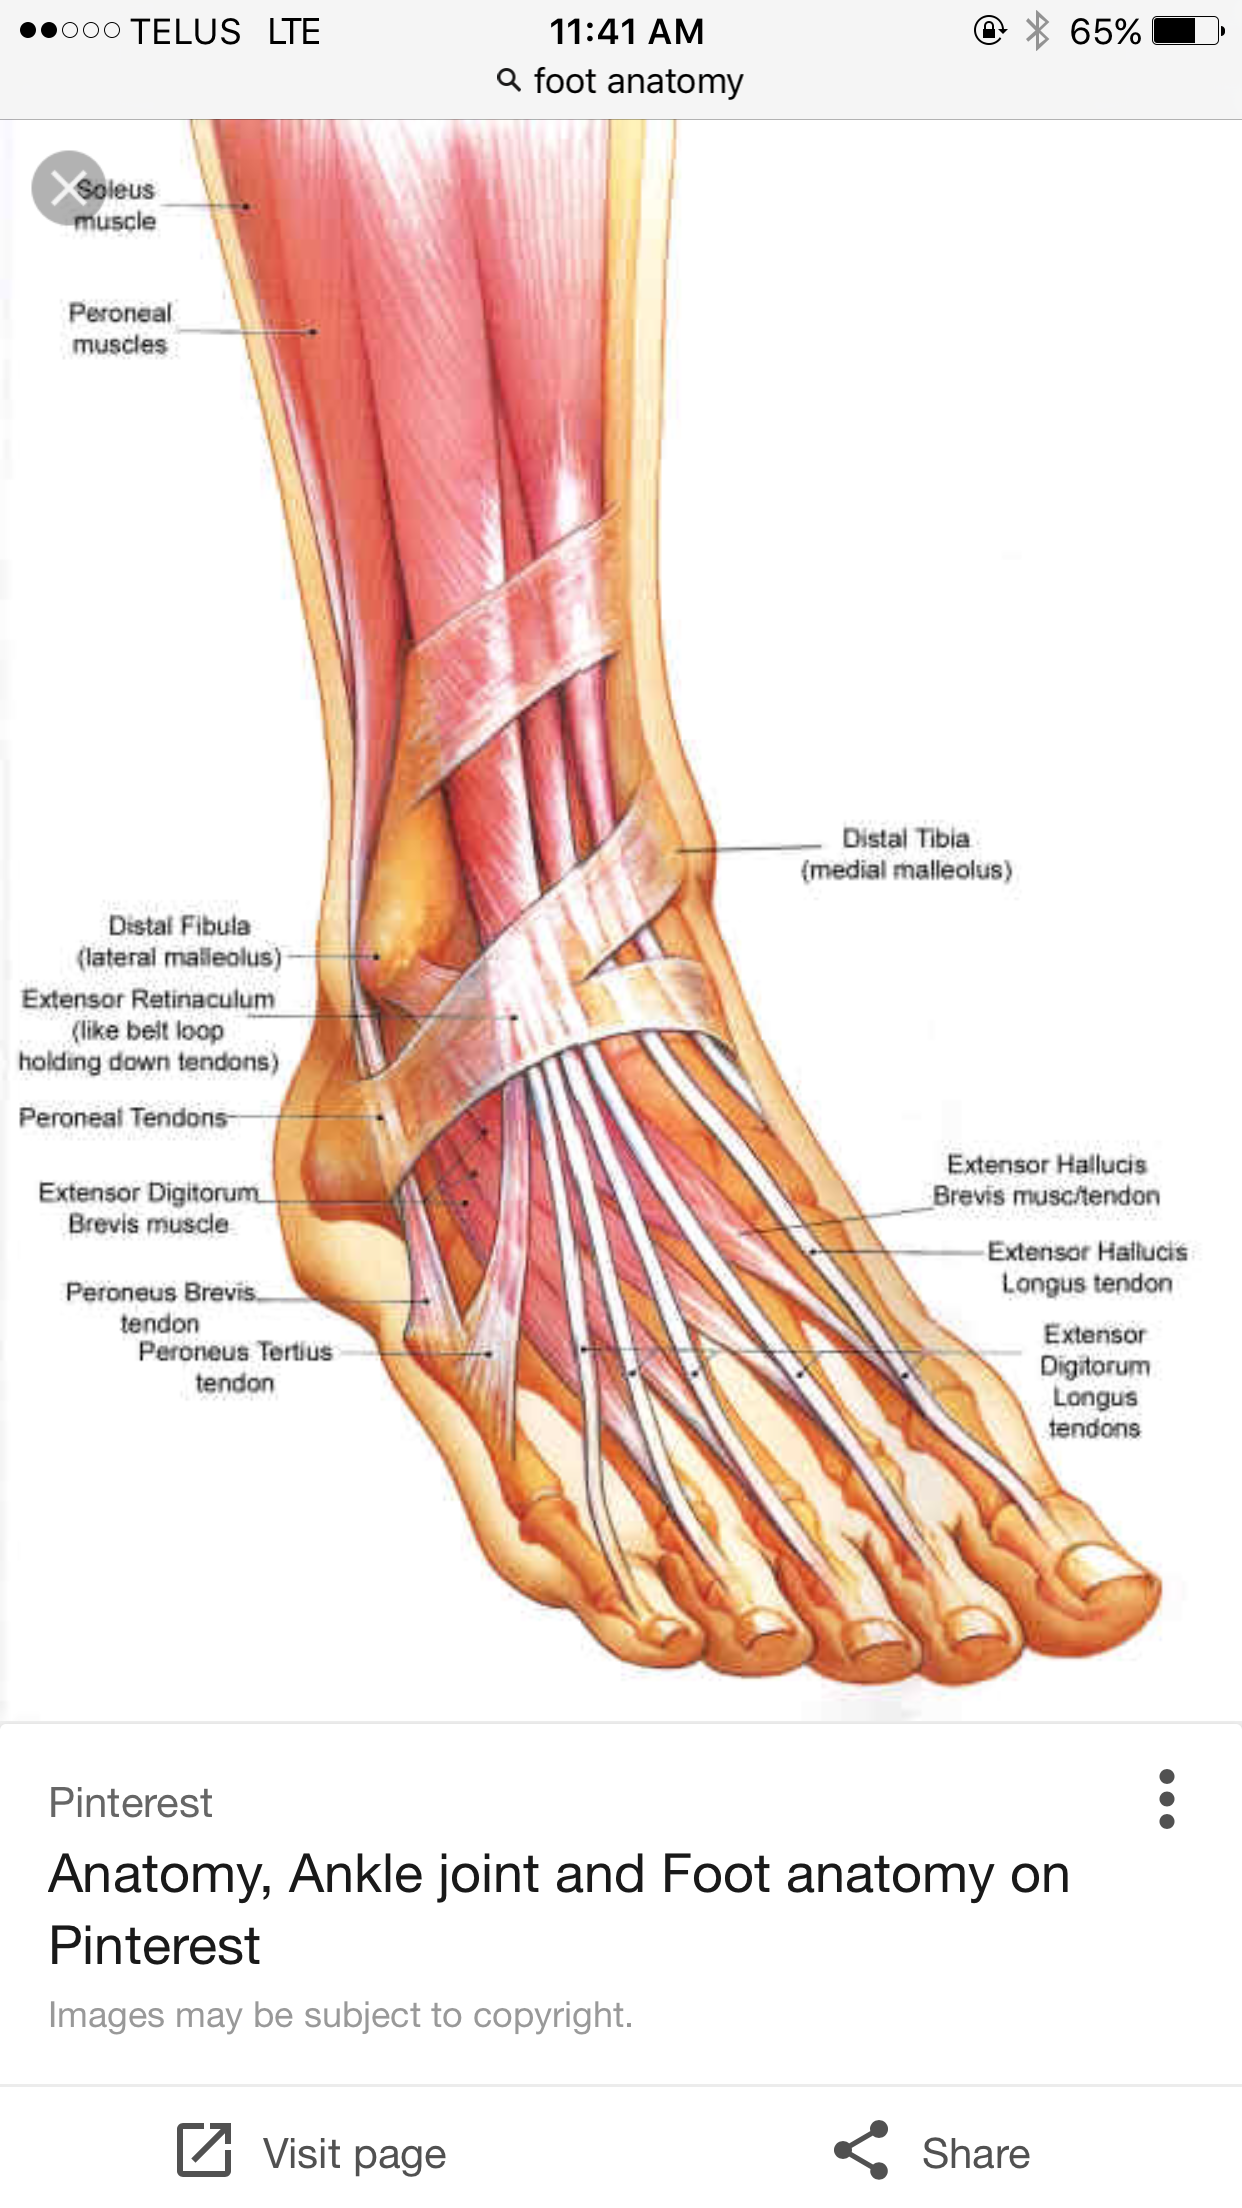 hight resolution of myndani ursta a fyrir latin words for nerves in feet anatomy